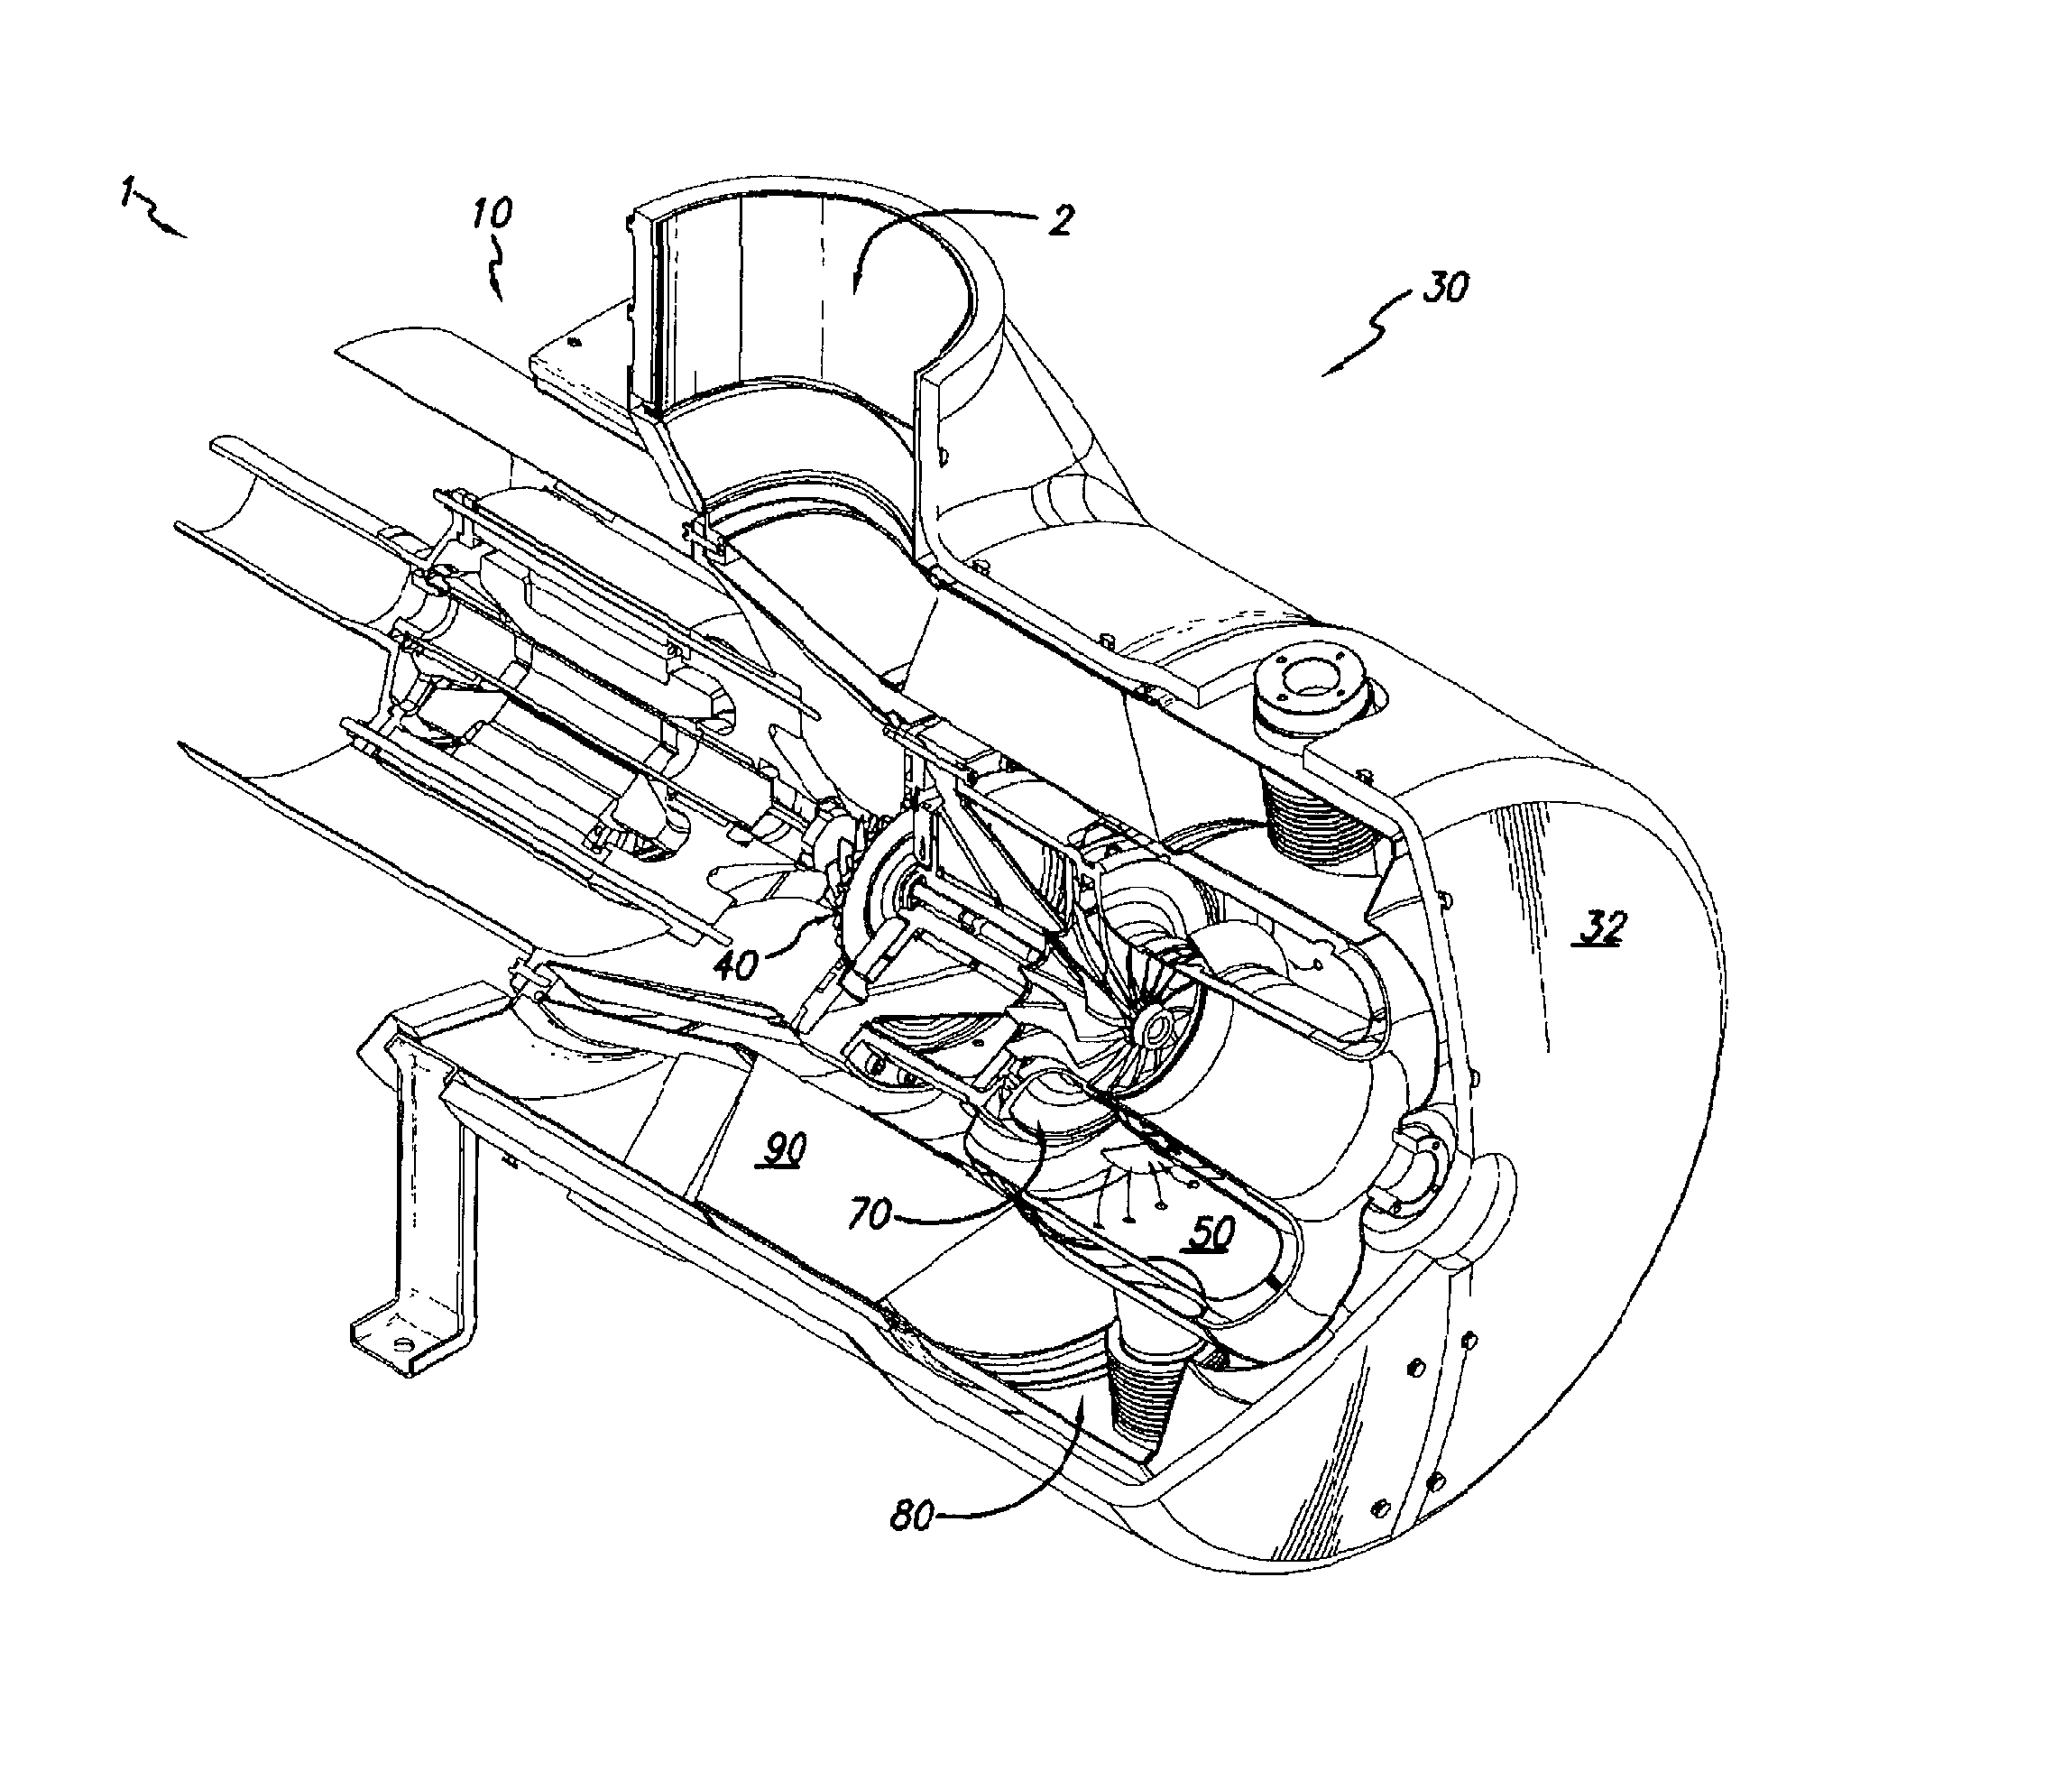 Patent US Microturbine capacitor power distribution